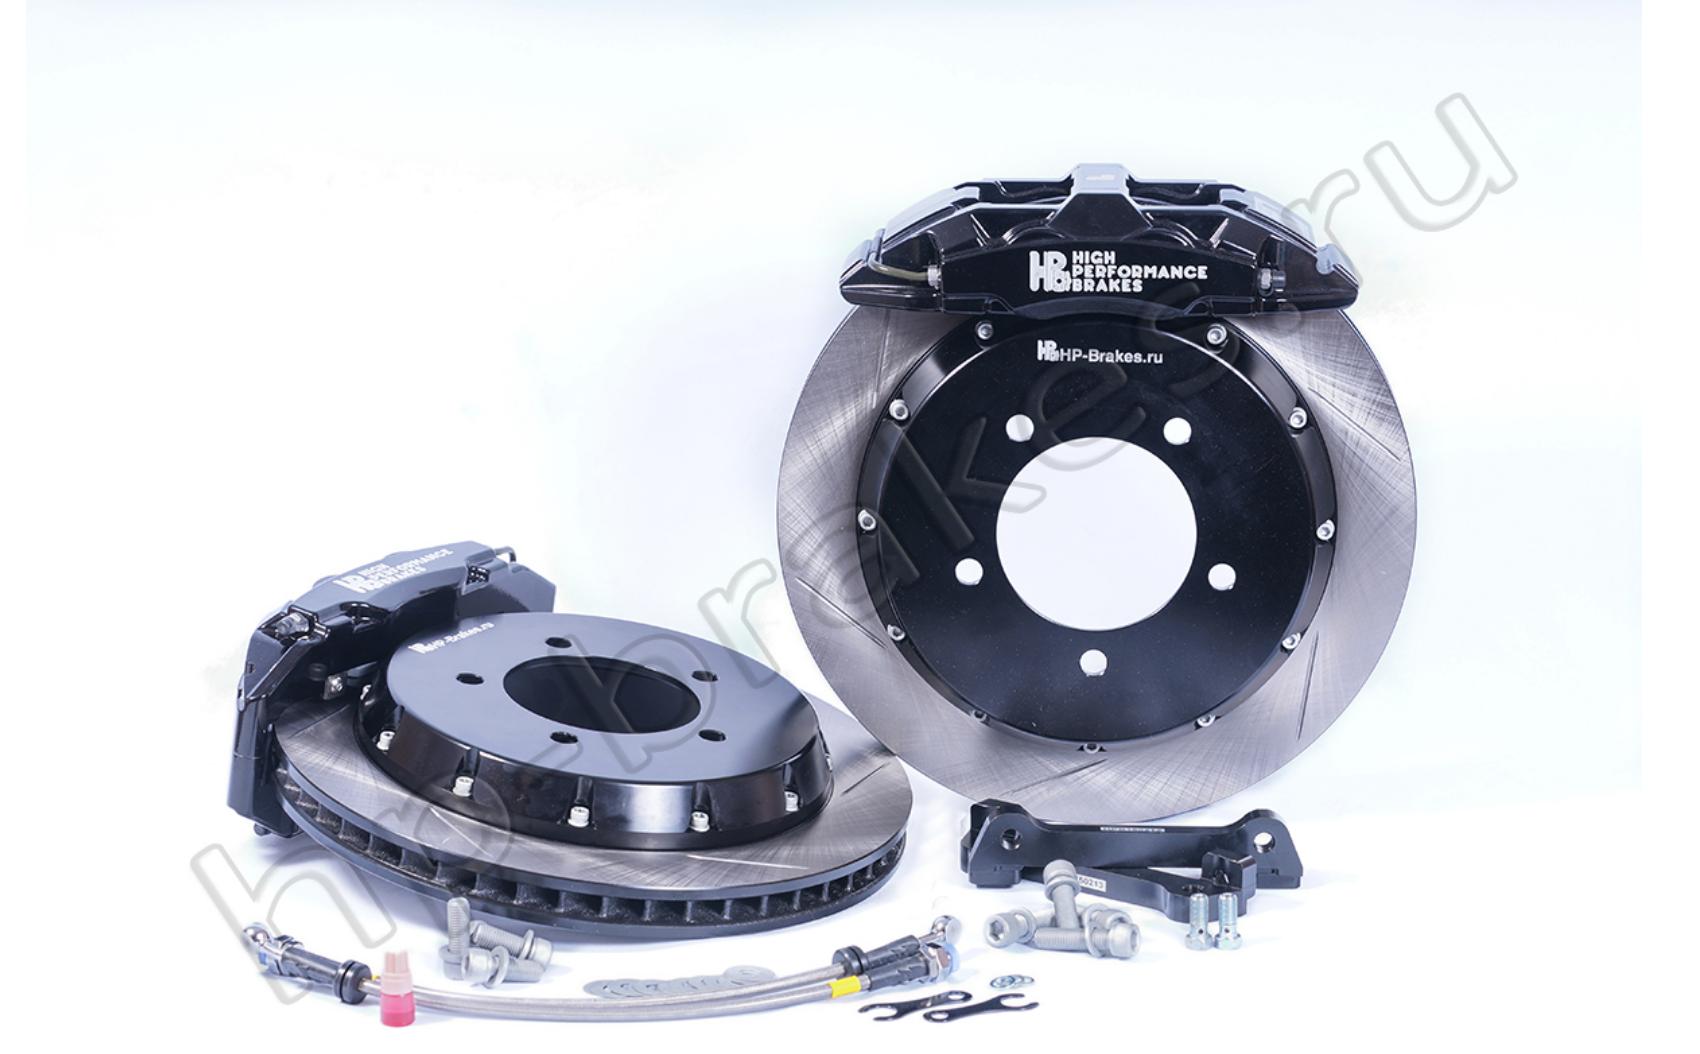 Тормозная система HP Brakes (Задняя ось, D18, 4 поршня, диск 365х30мм)